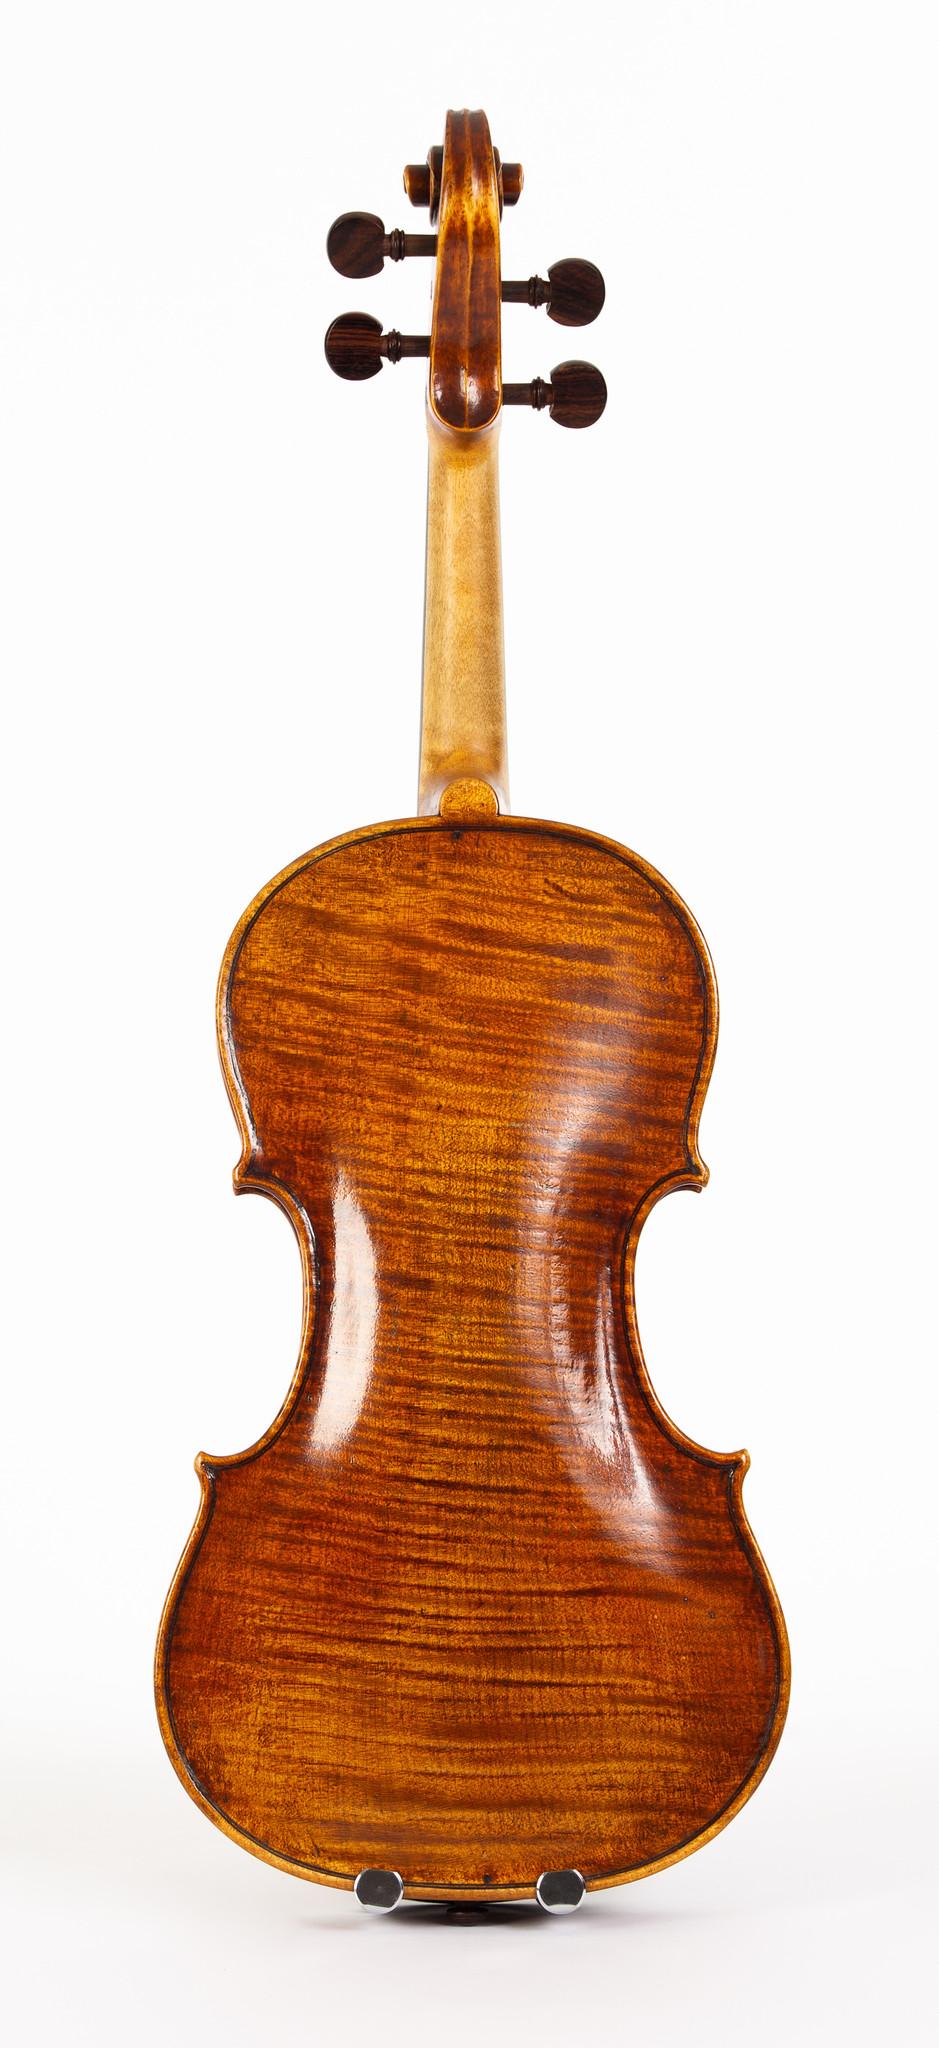 Jason Starkie violin, 2016, Sentaraille à Berdot